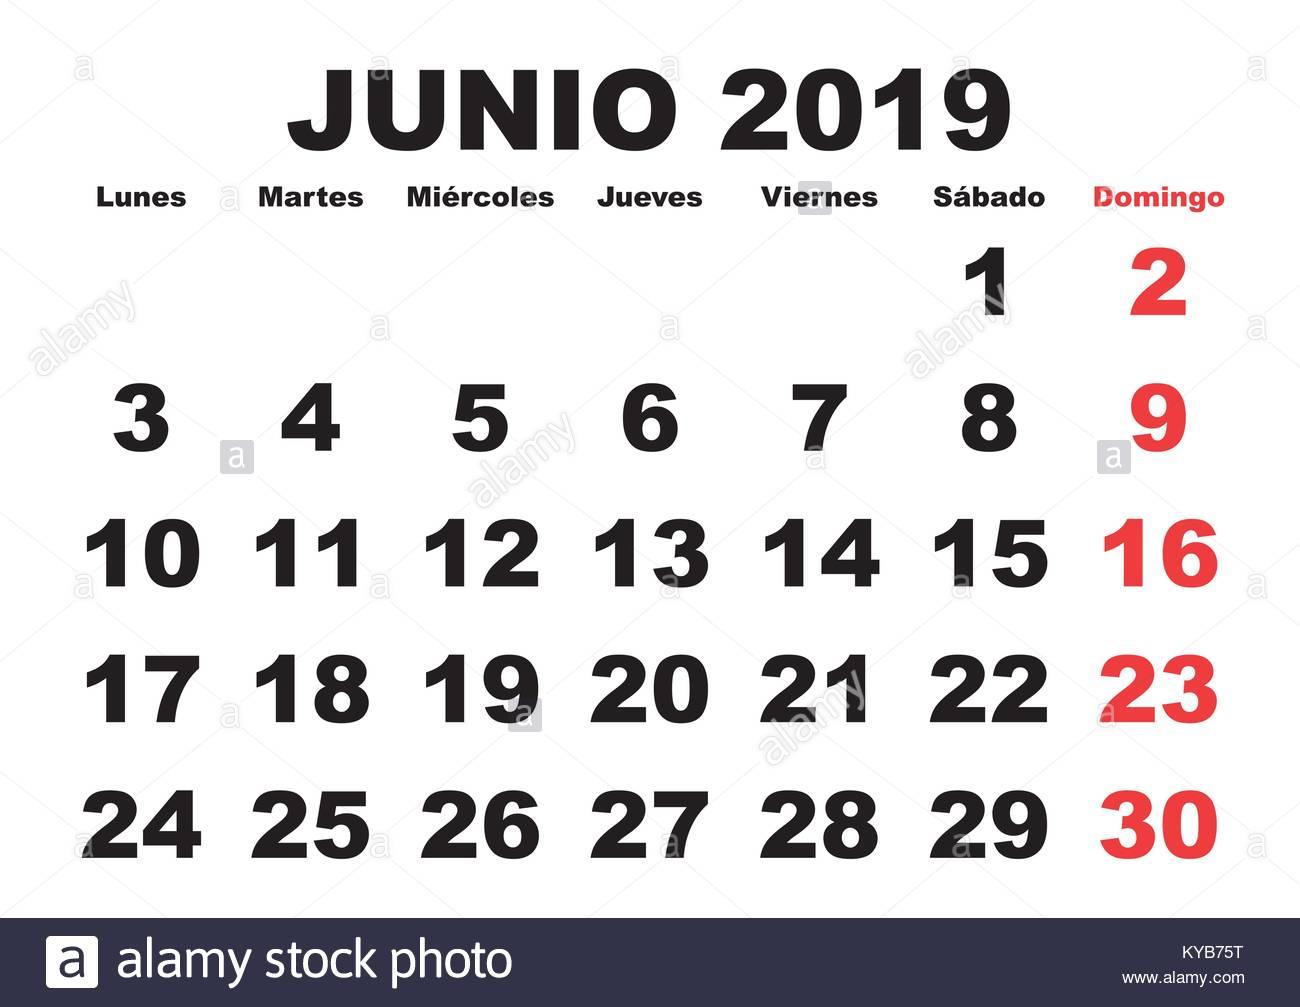 June month in a year 2019 wall calendar in spanish. Junio 2019. Calendario  2019